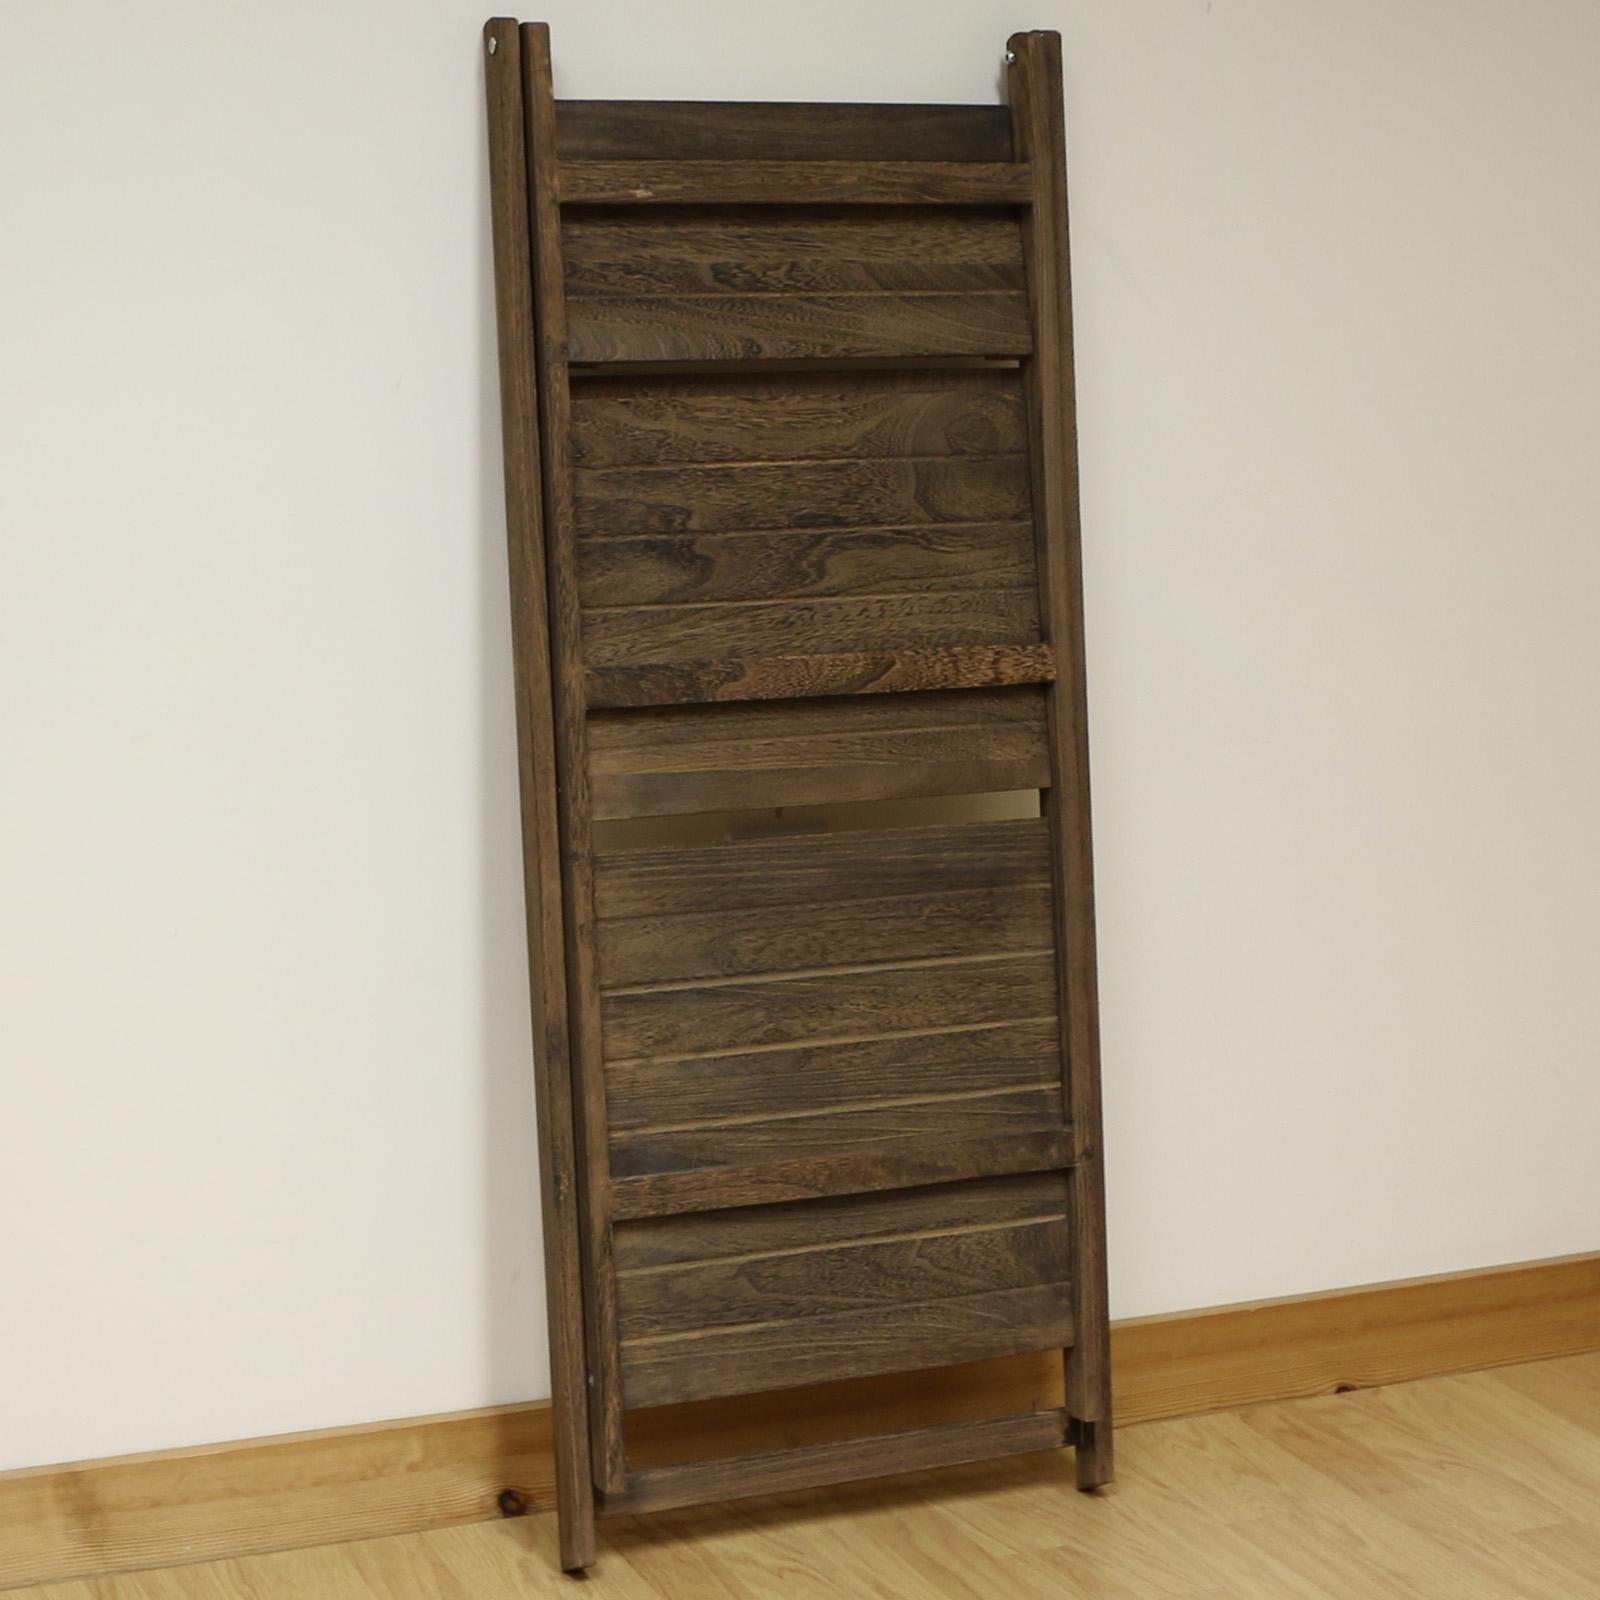 3 Tier Brown Ladder Shelf Display Unit Free Standing